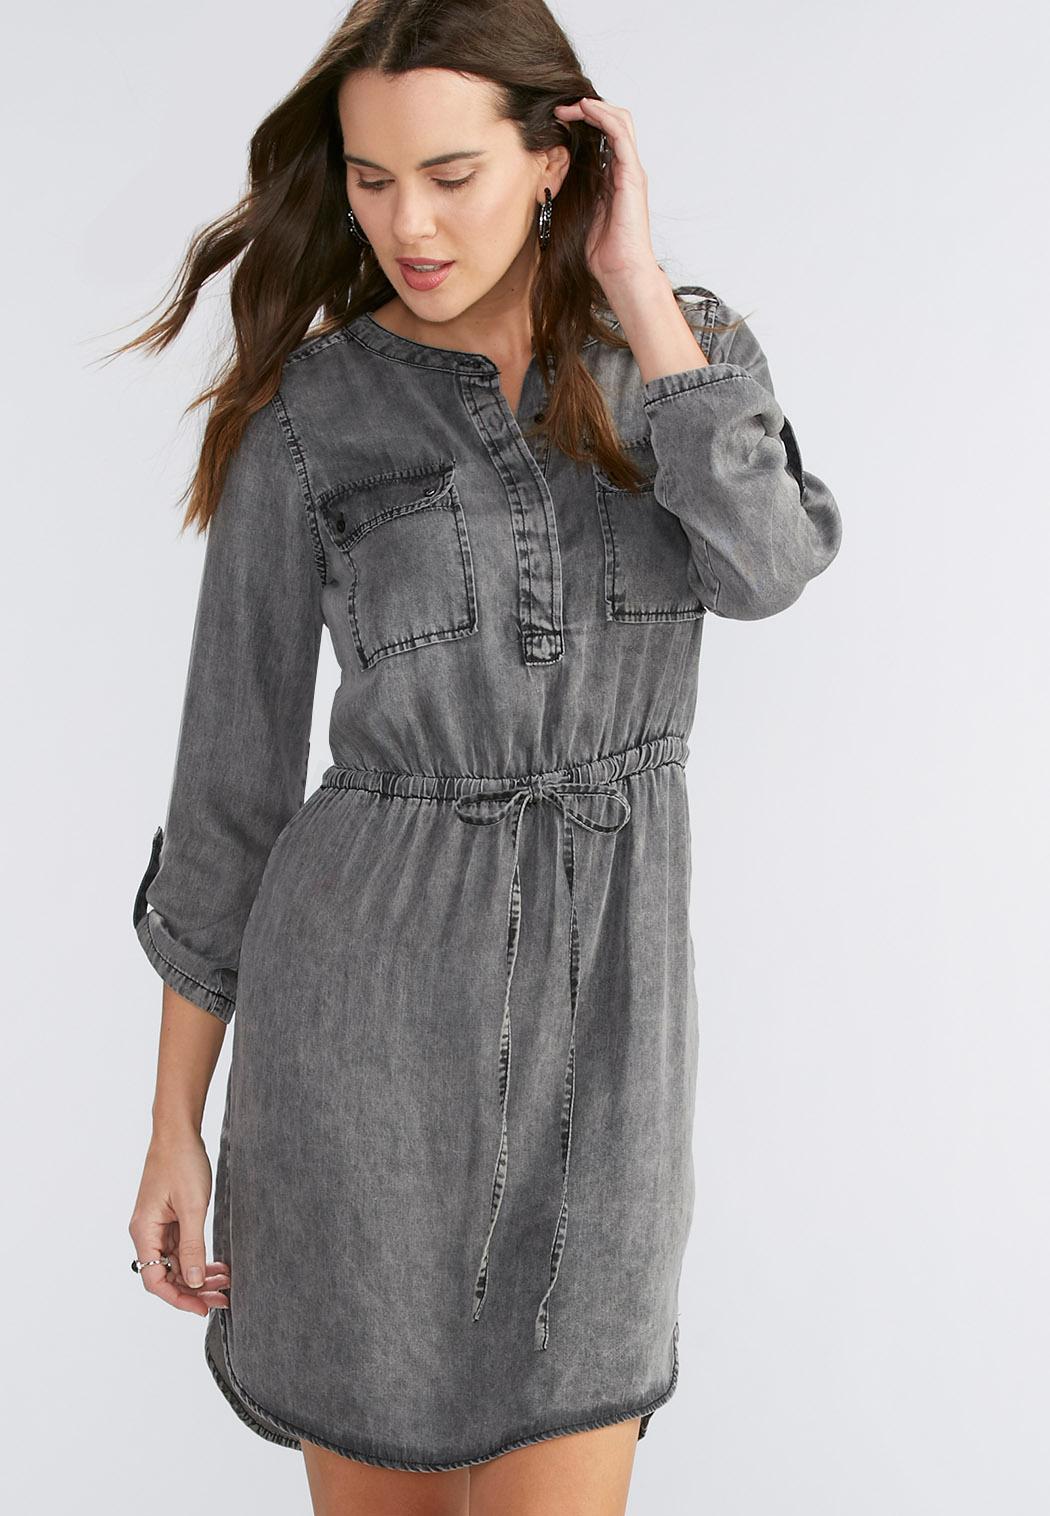 Black wash chambray shirt dress plus plus sizes cato for Plus size chambray shirt